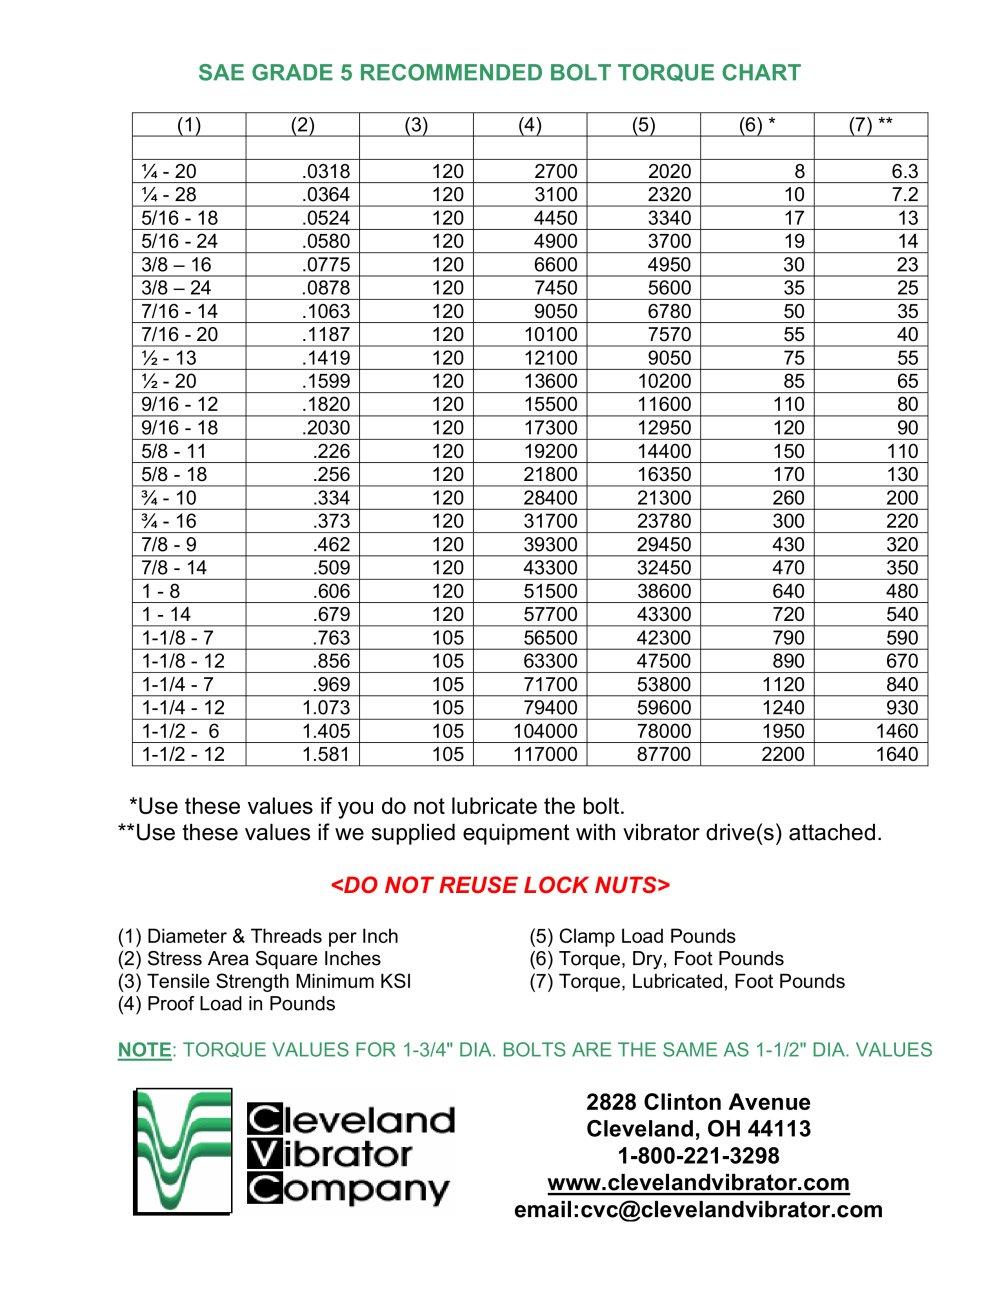 kevin clontz Torque Value Chart – Sample Bolt Torque Chart